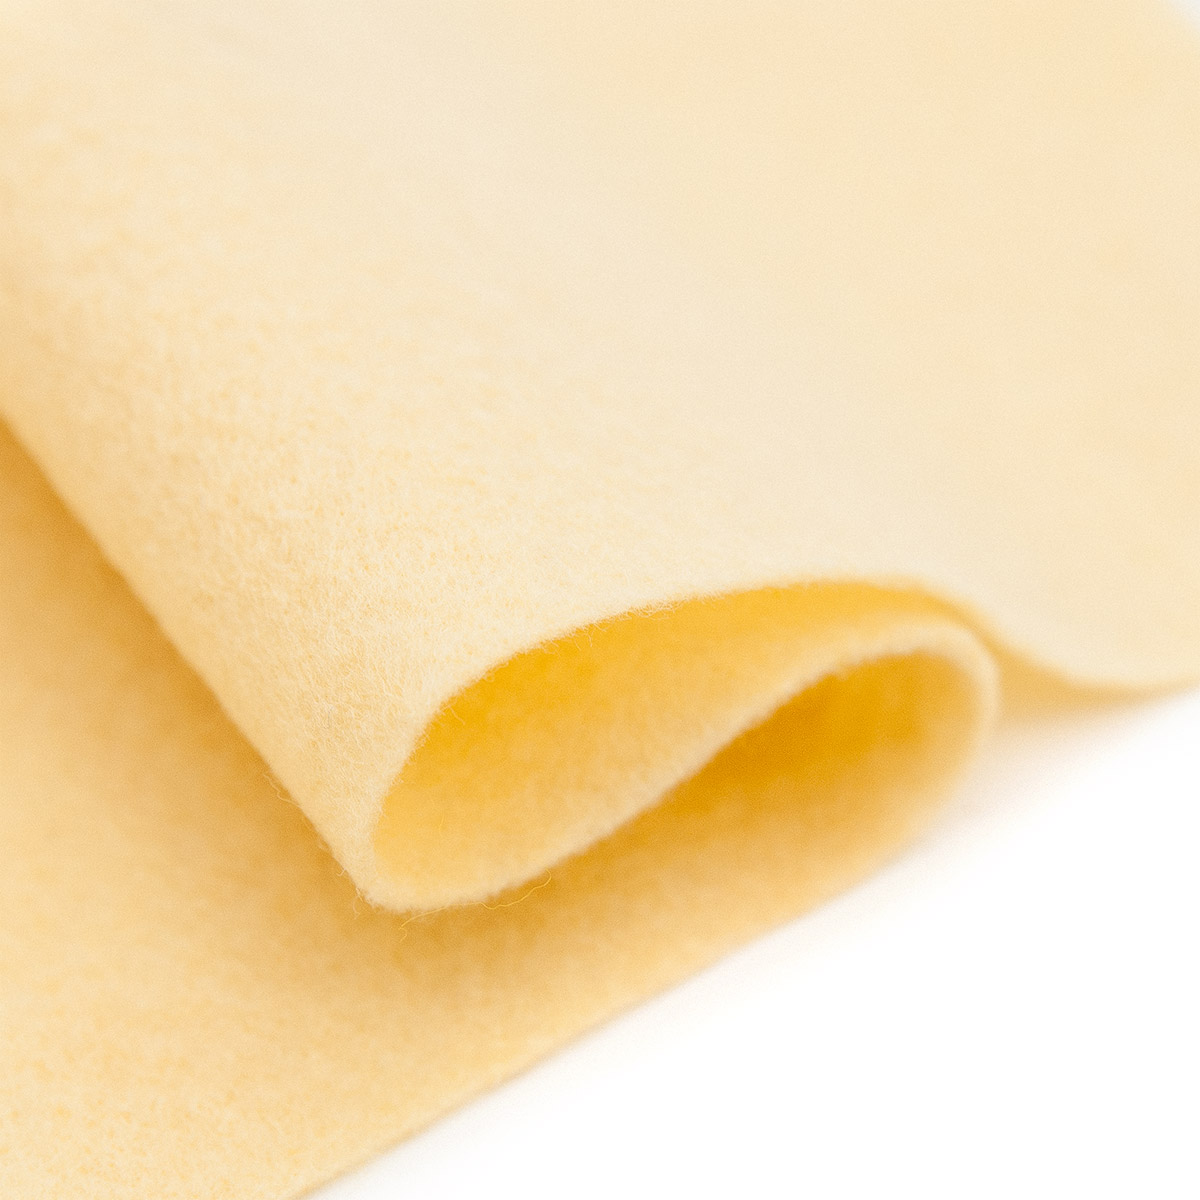 61212613 Фетр для творчества, коричнево-желтый, 2мм, 20x30см, уп./1шт. Glorex